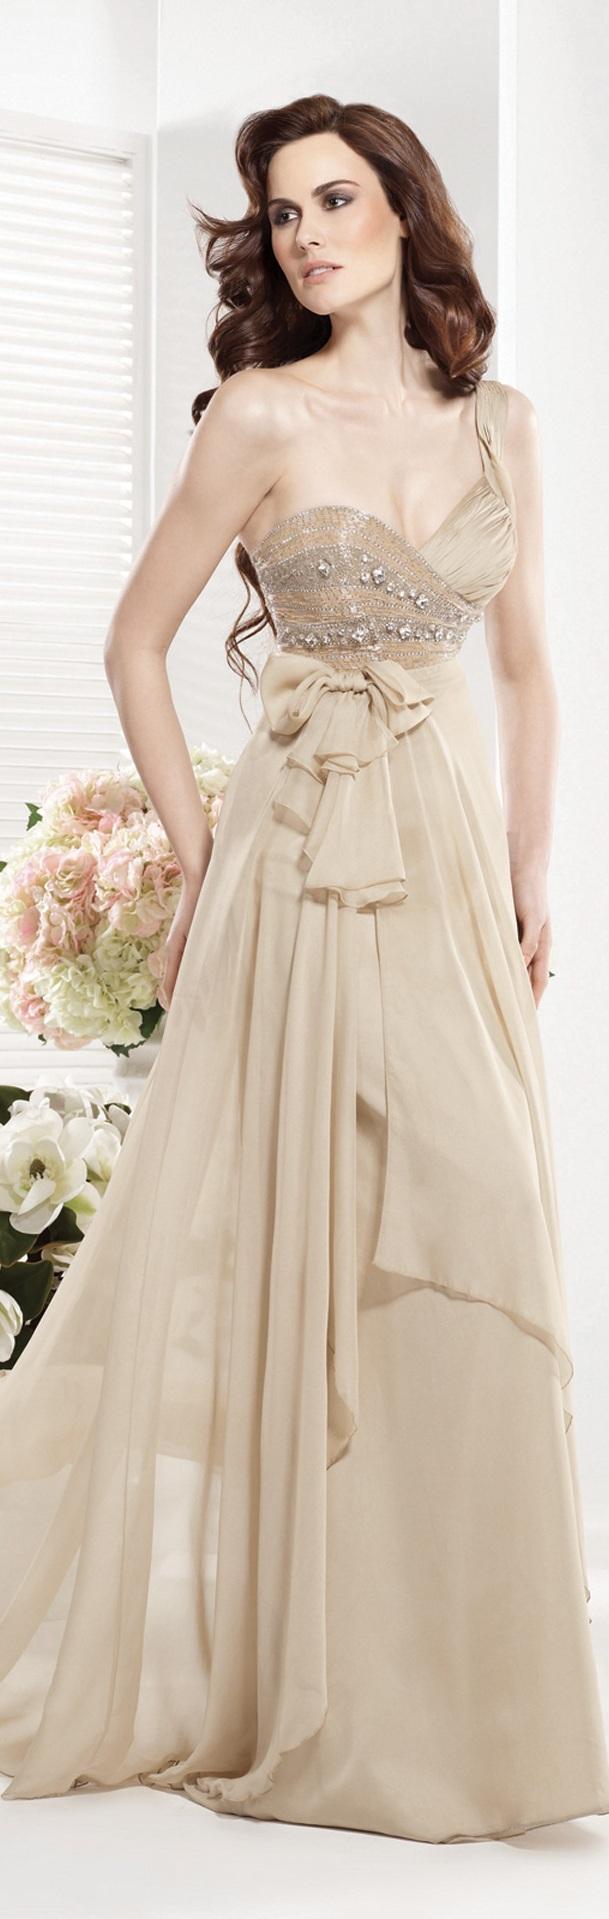 Tarik ediz couture beautiful neutral tarik ediz pinterest